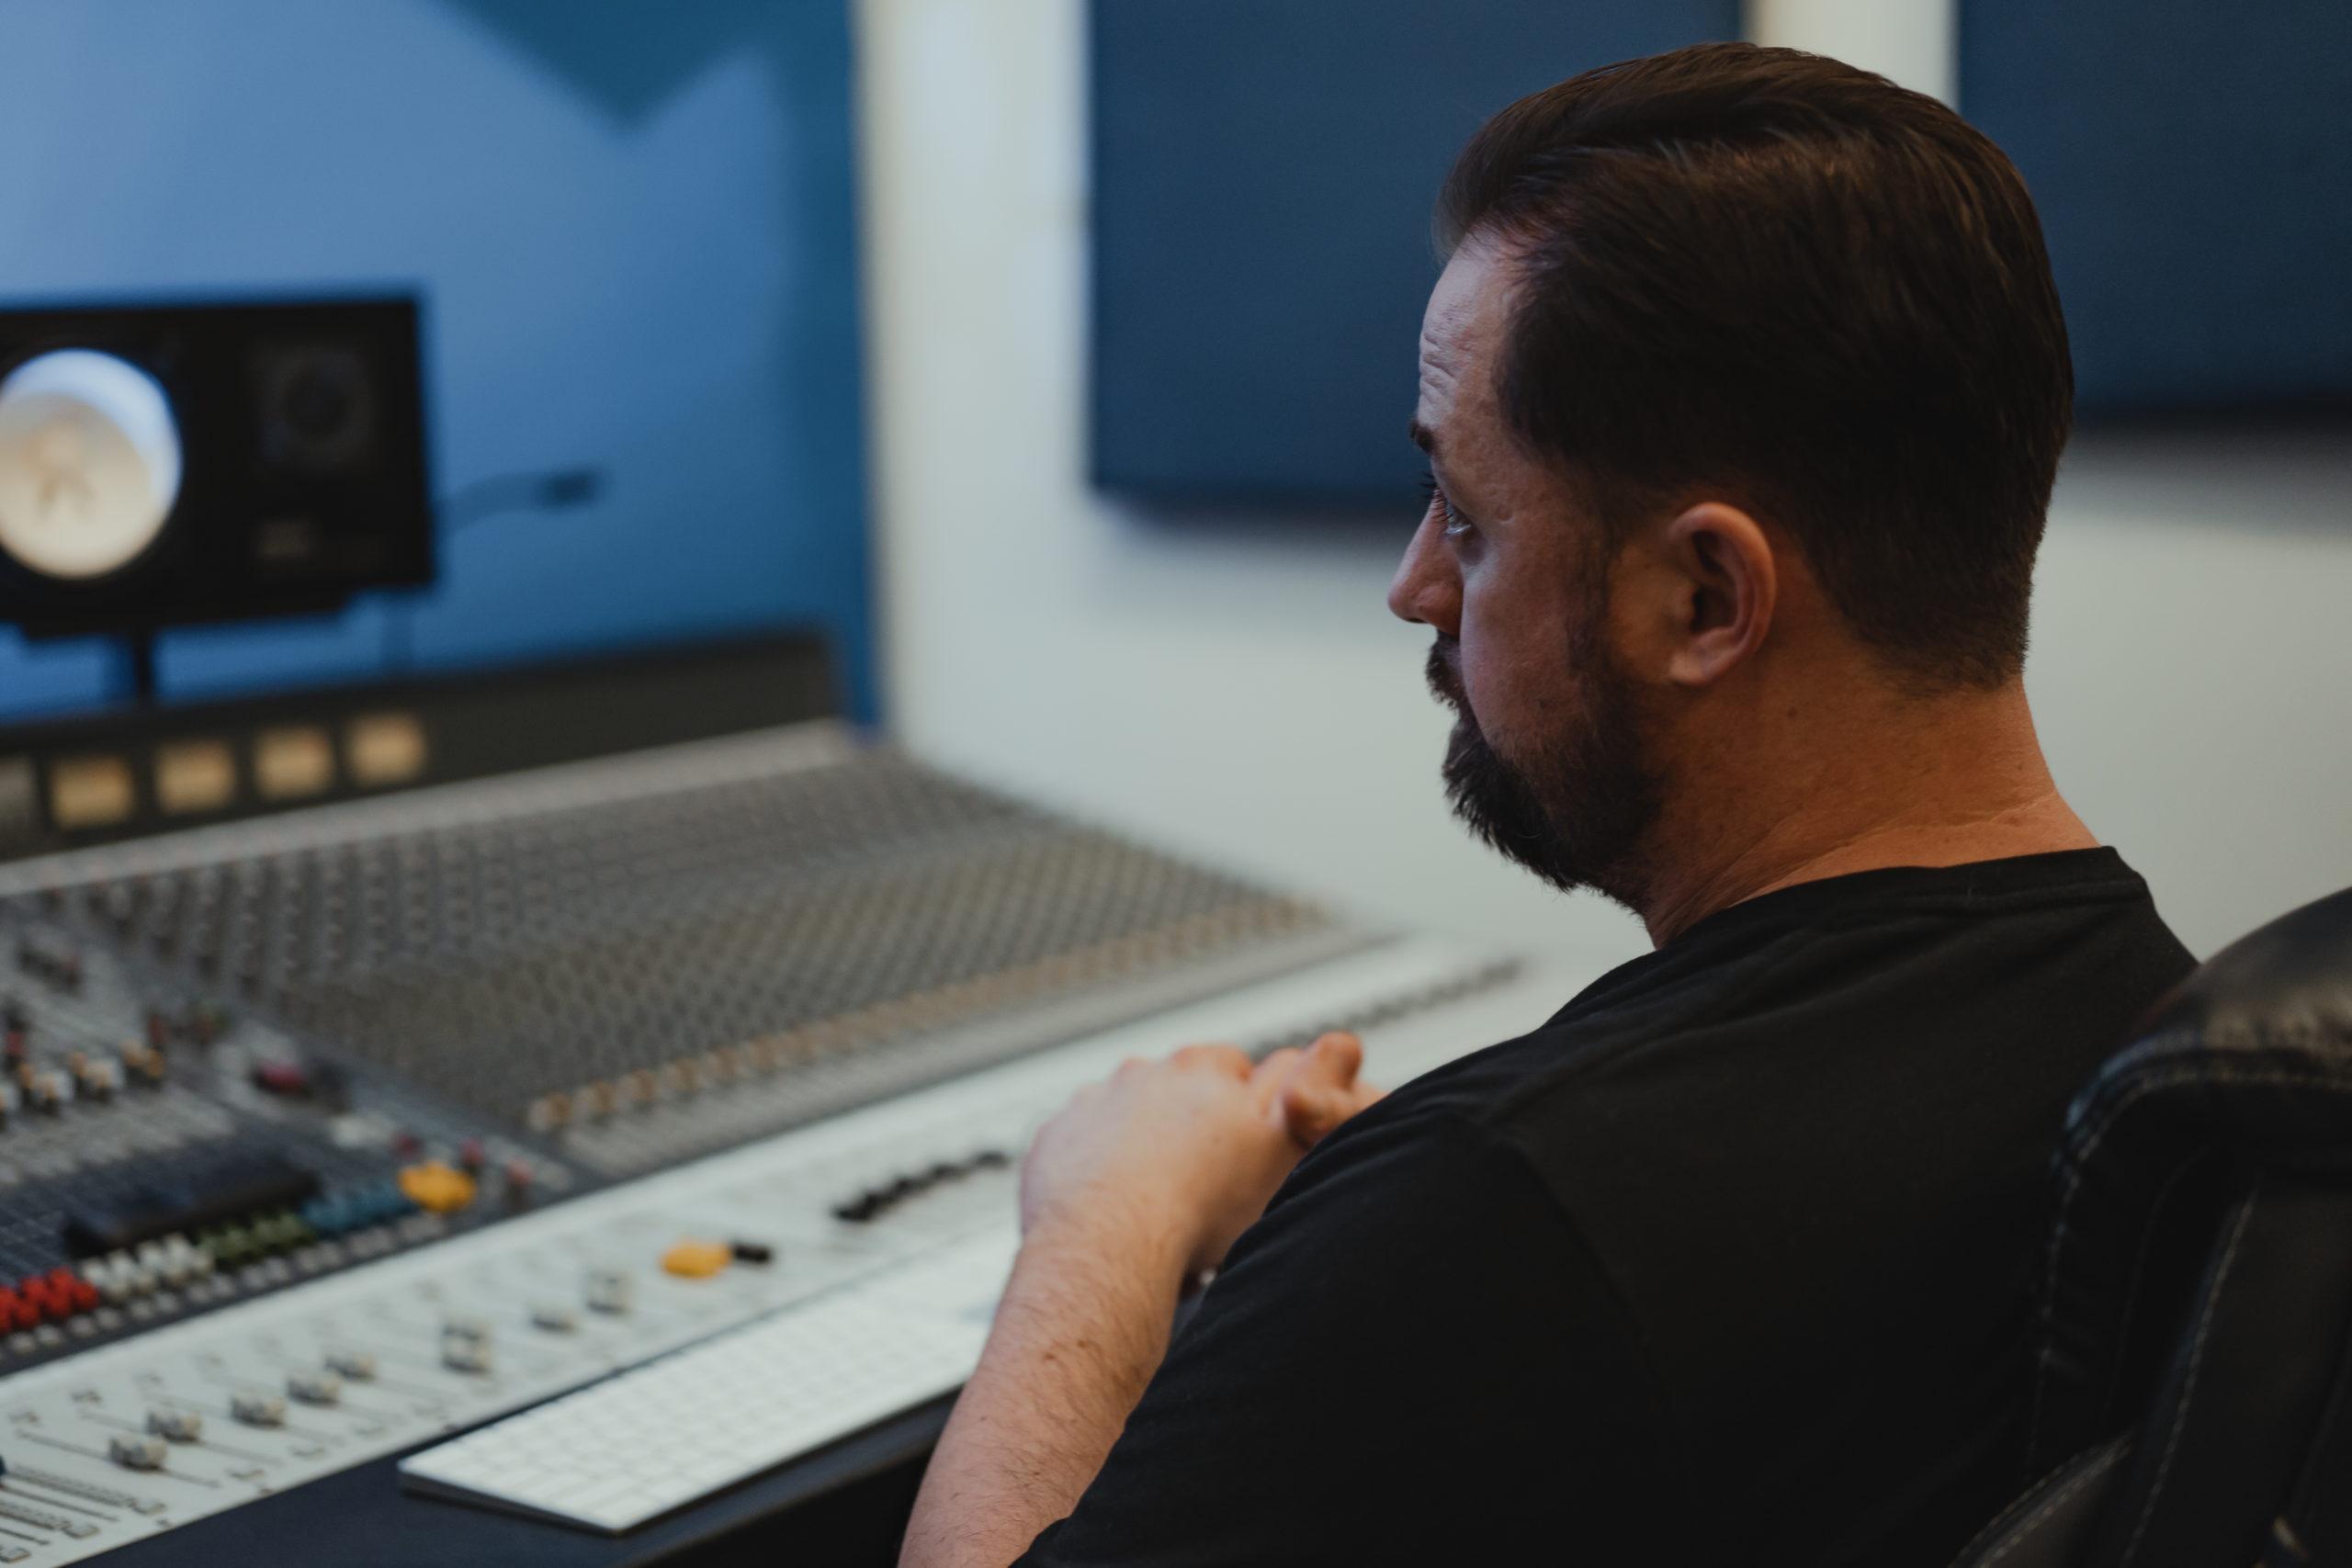 videoshoot at becon studio using green screen